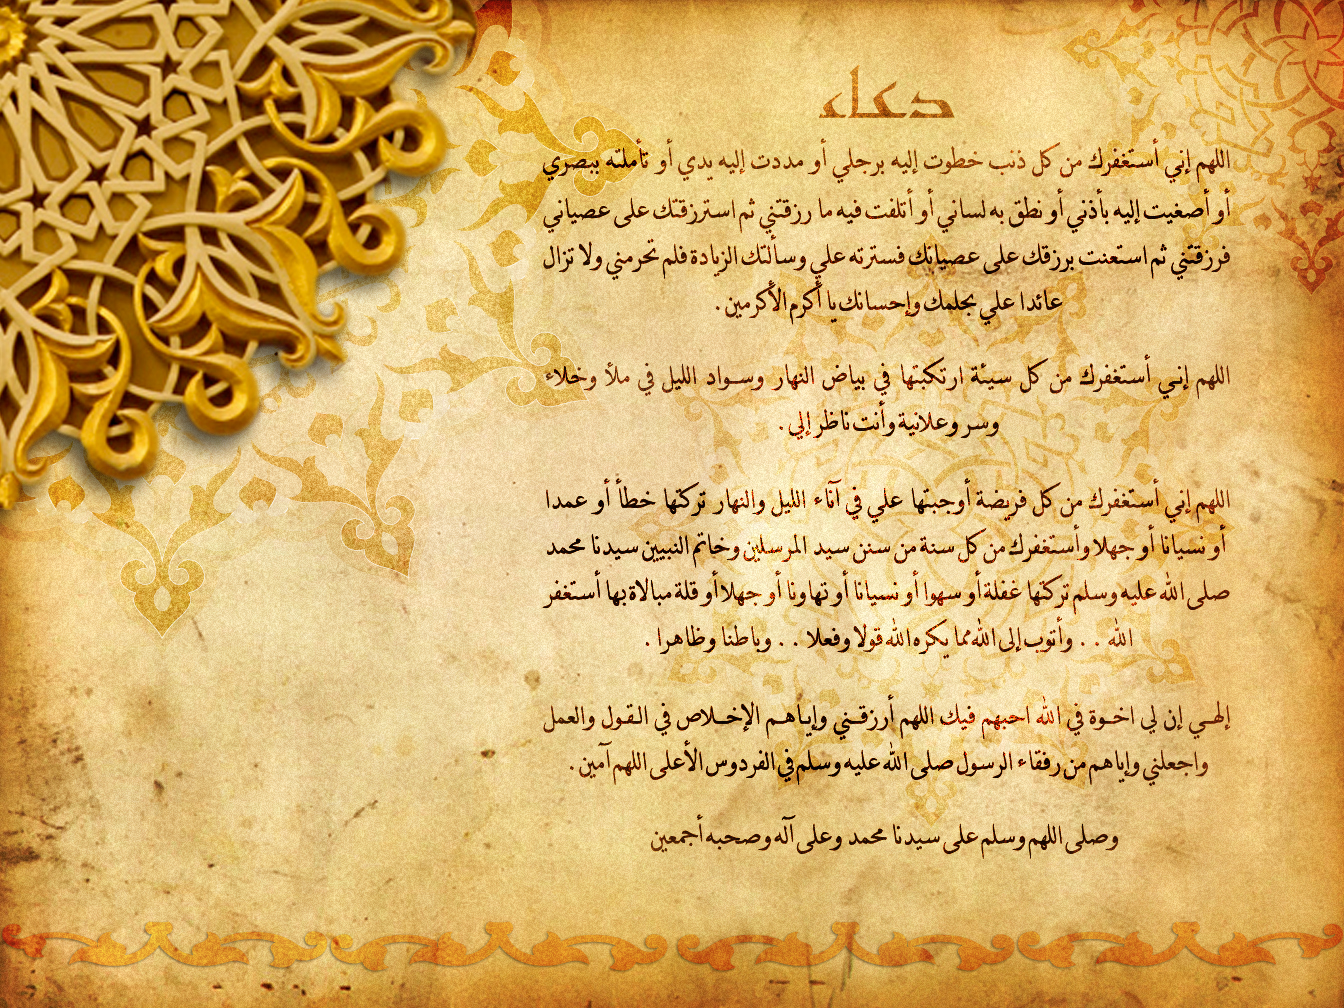 islamic wallpaper No 5 1344x1008